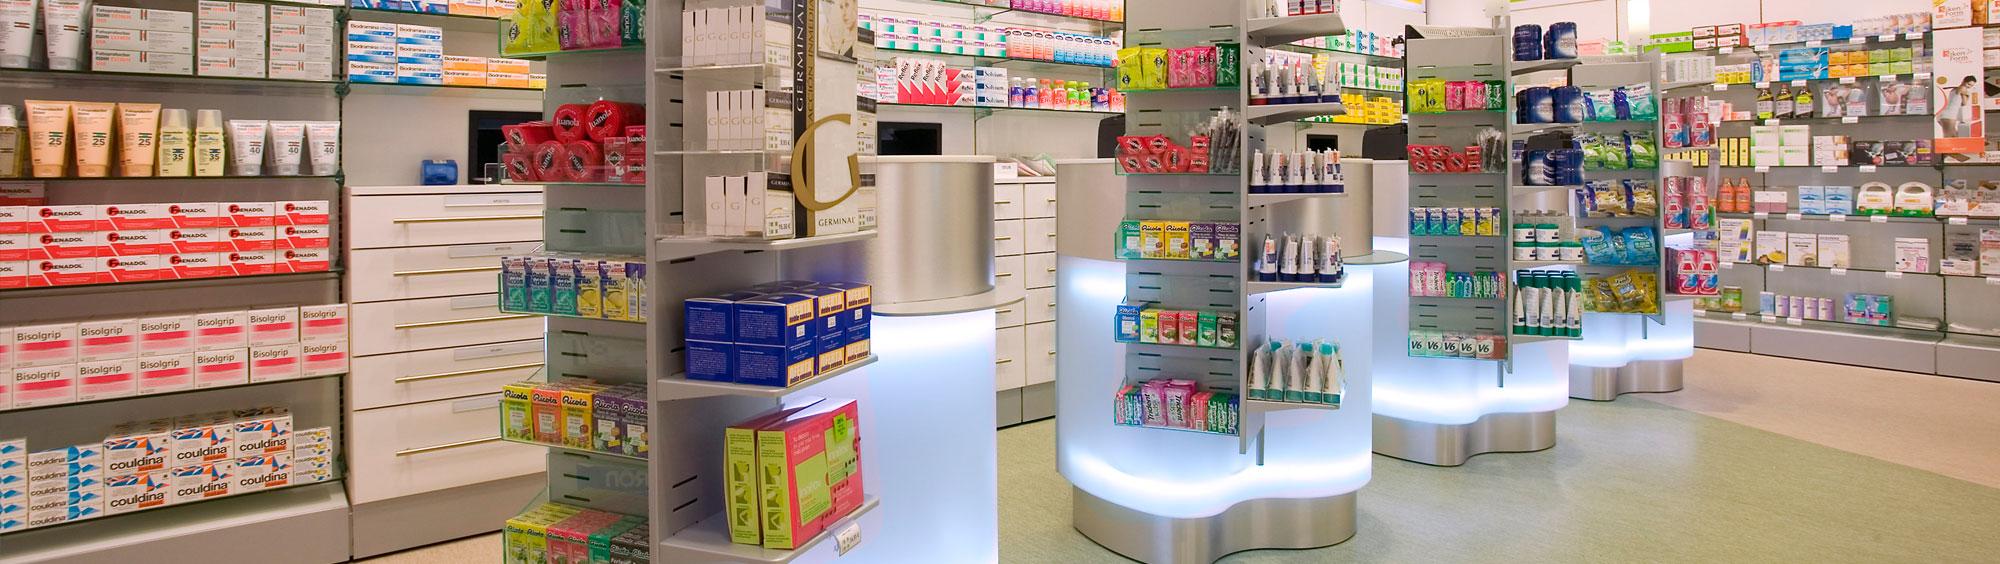 Traspado de farmacia interior